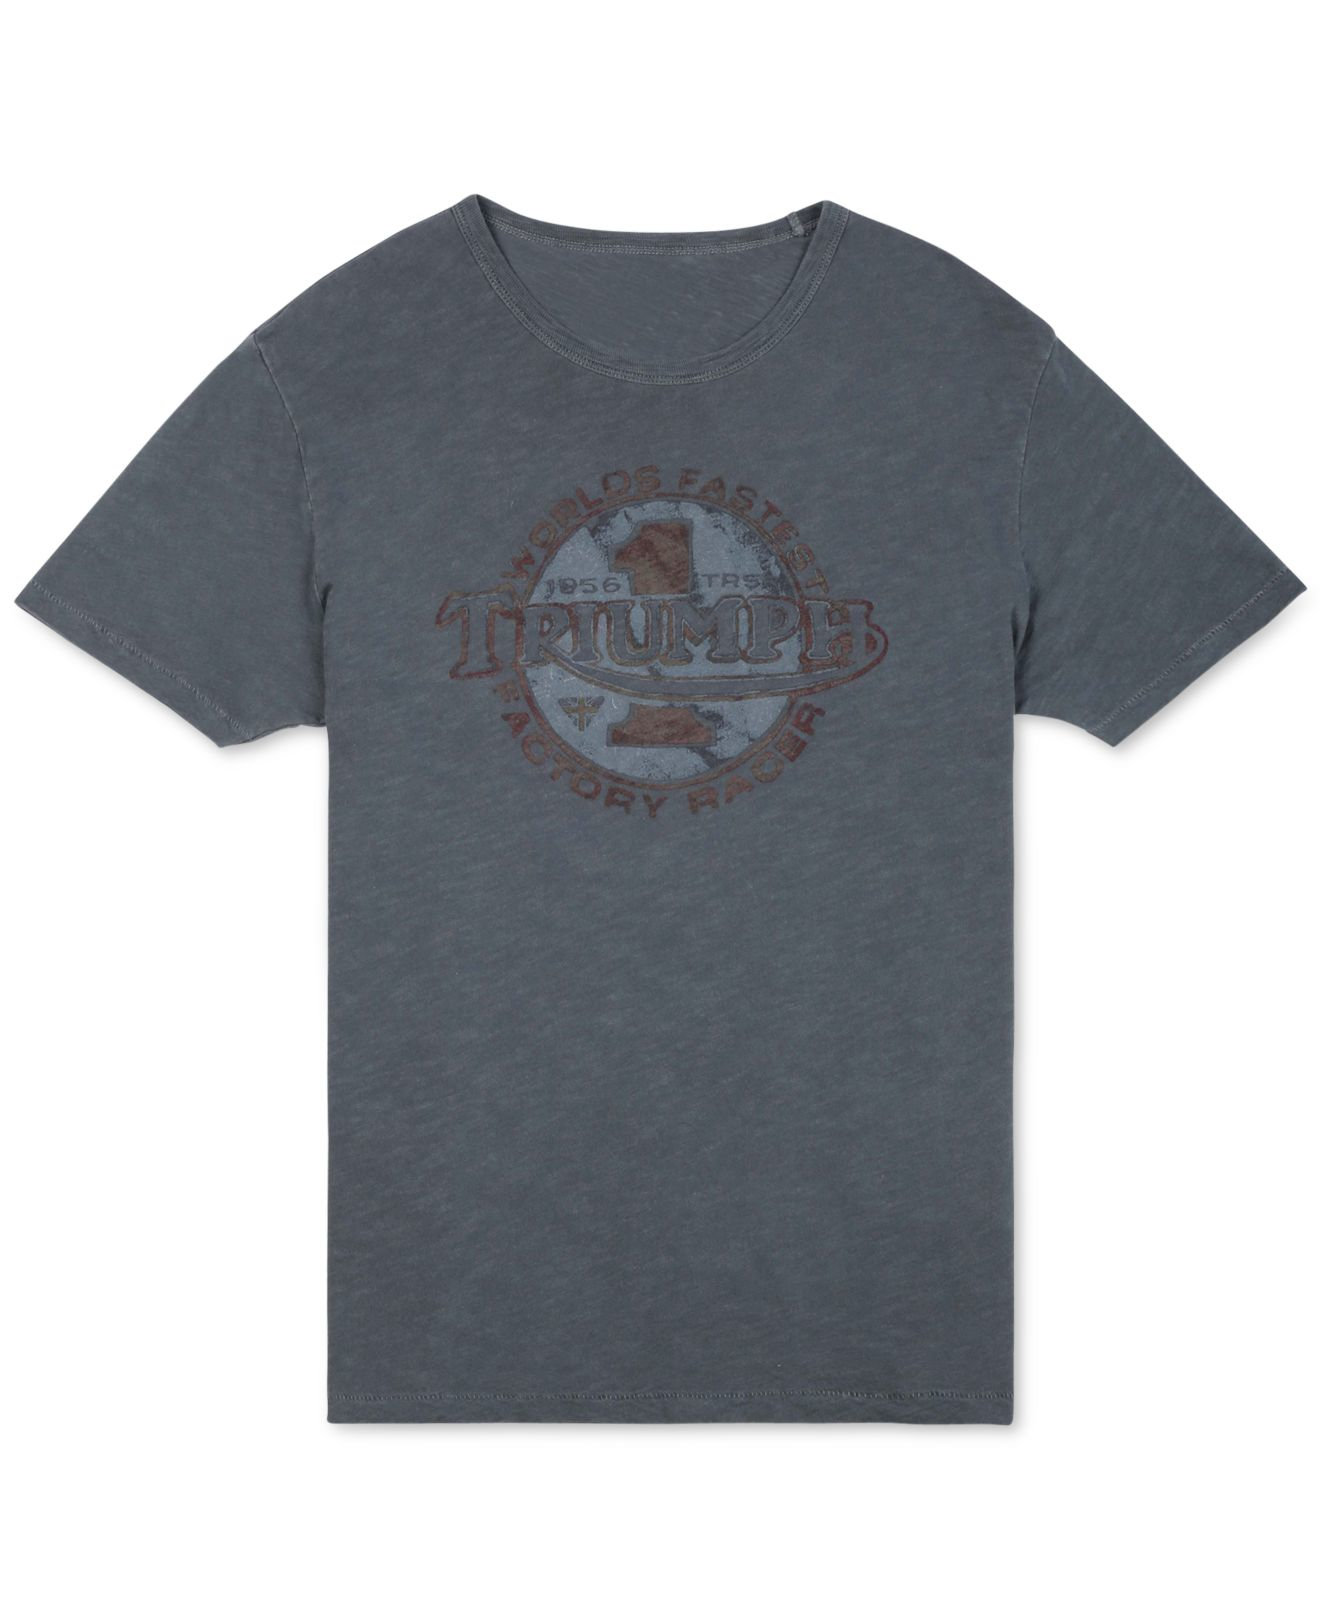 Lyst lucky brand triumph worlds fastest t shirt in blue for Lucky brand triumph shirt